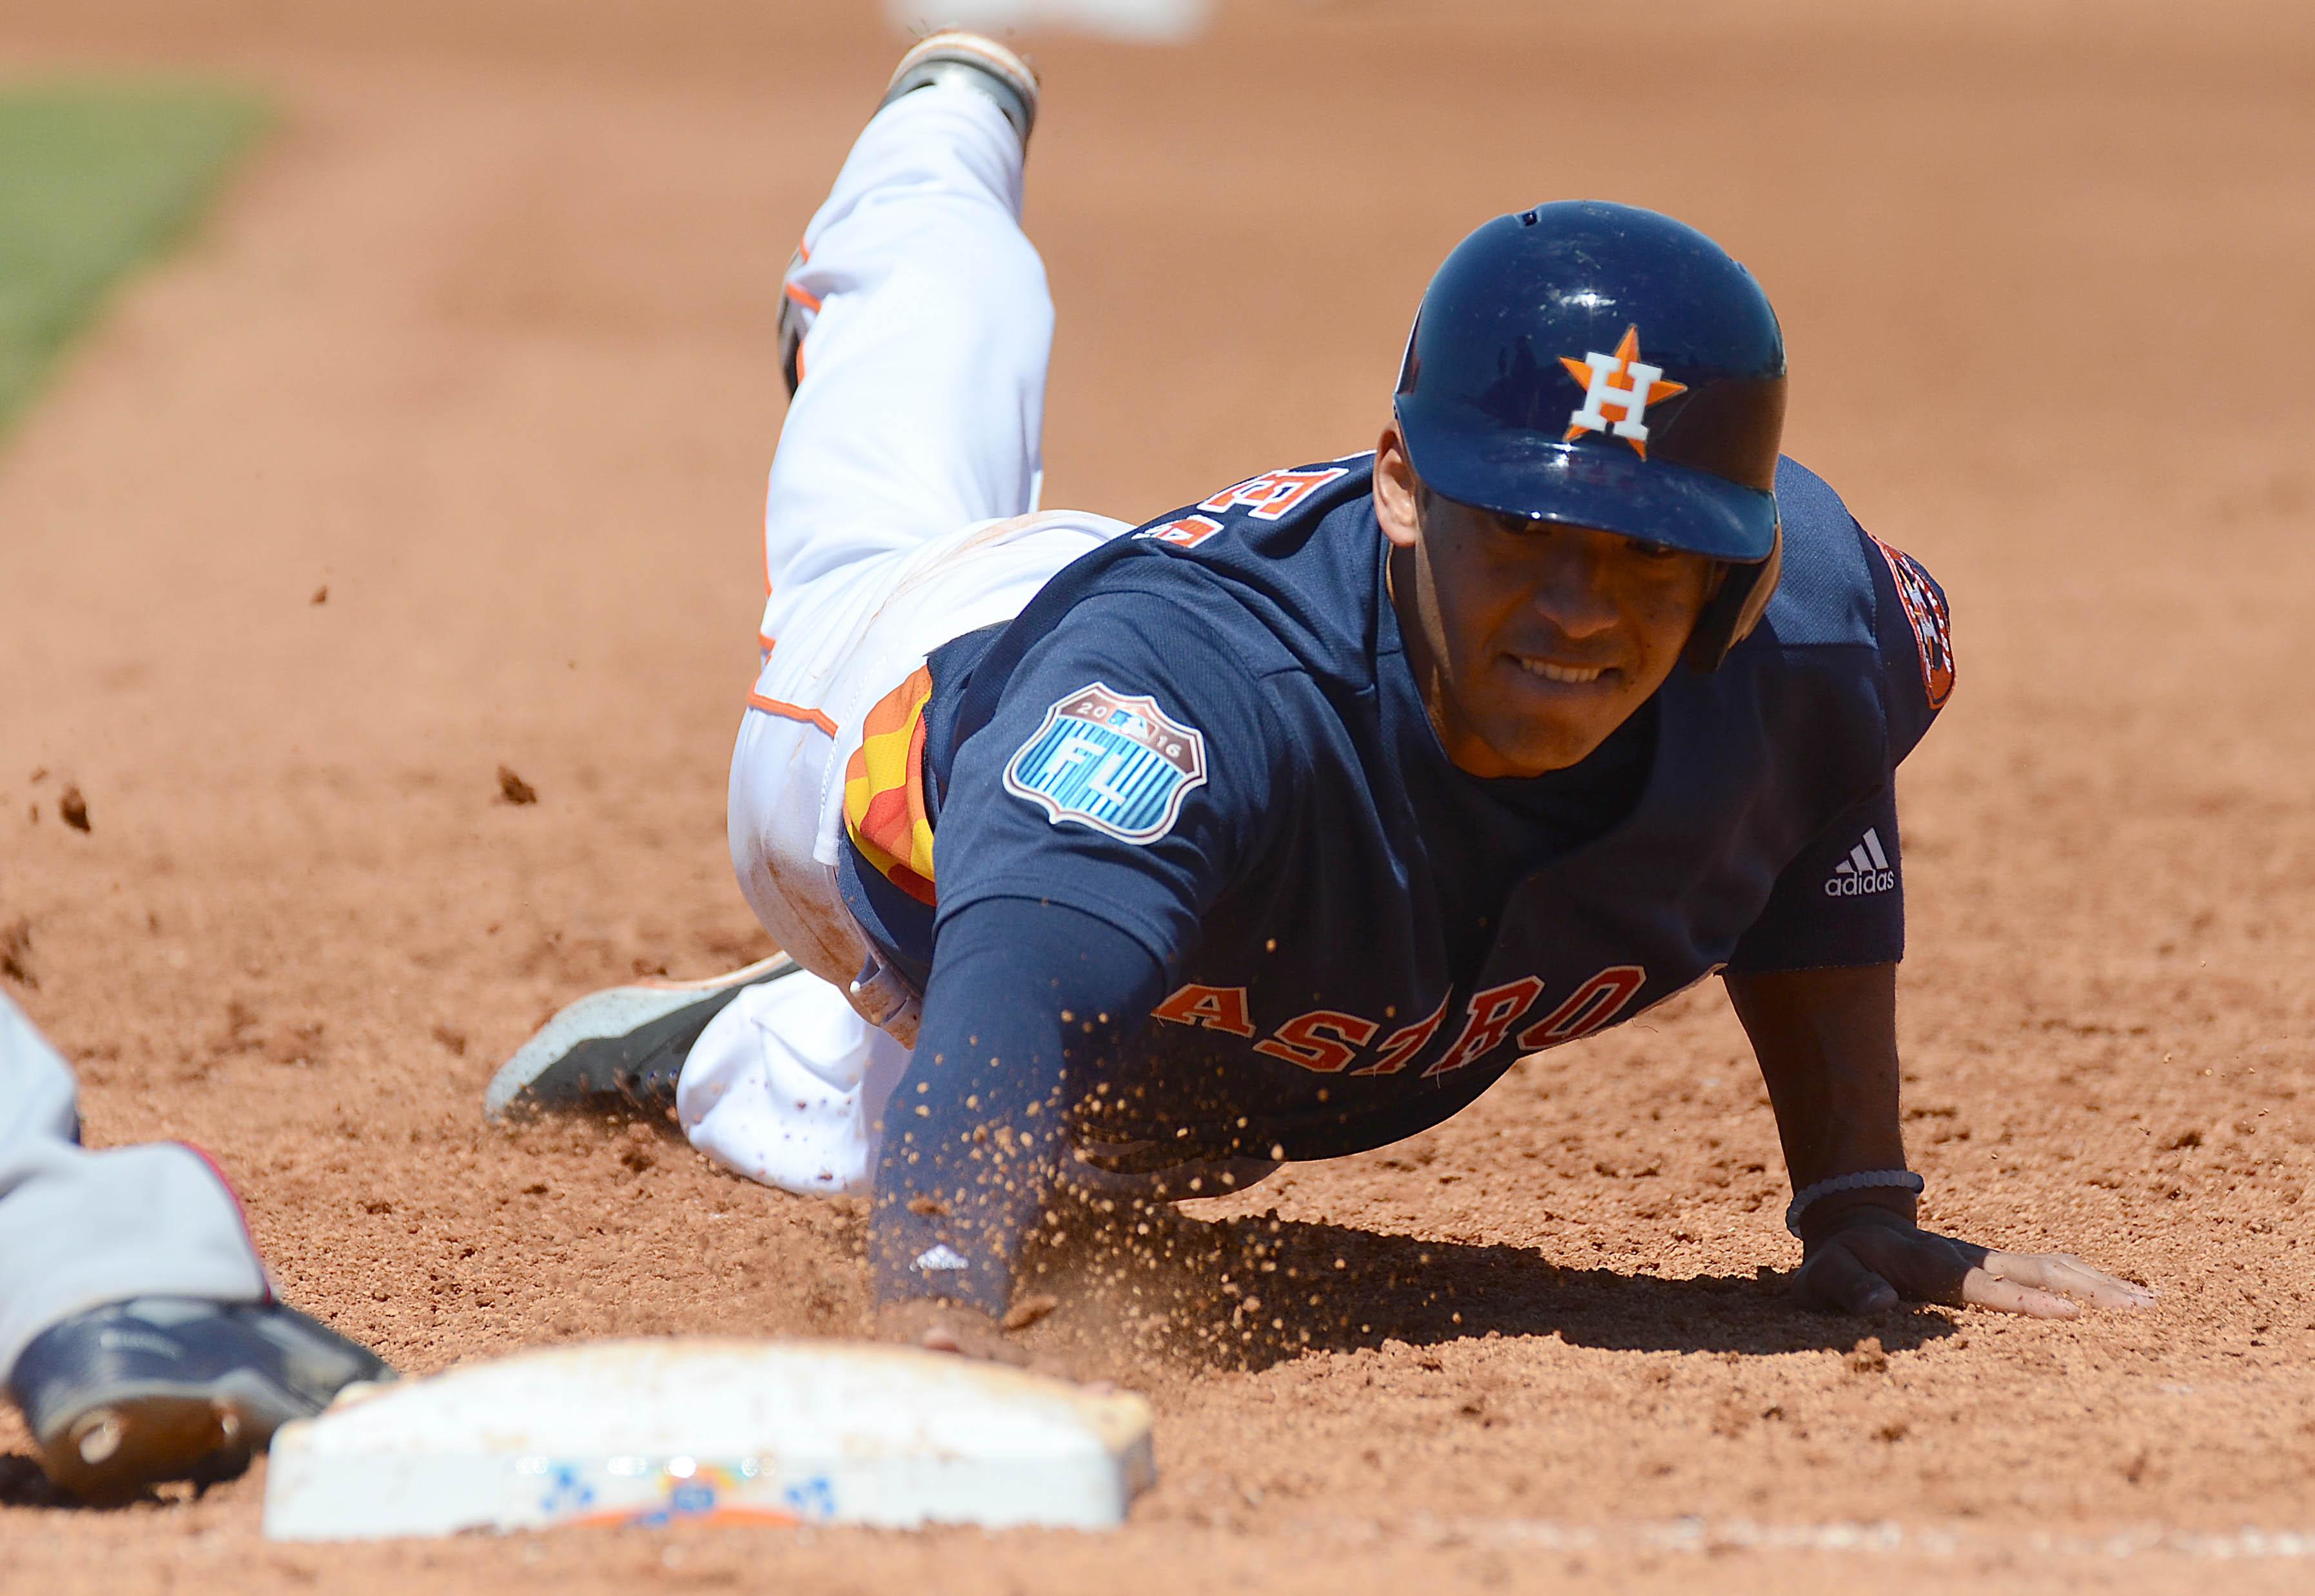 18856a4ddf4 A Conversation With Carlos Correa. The Houston Astro talks ...